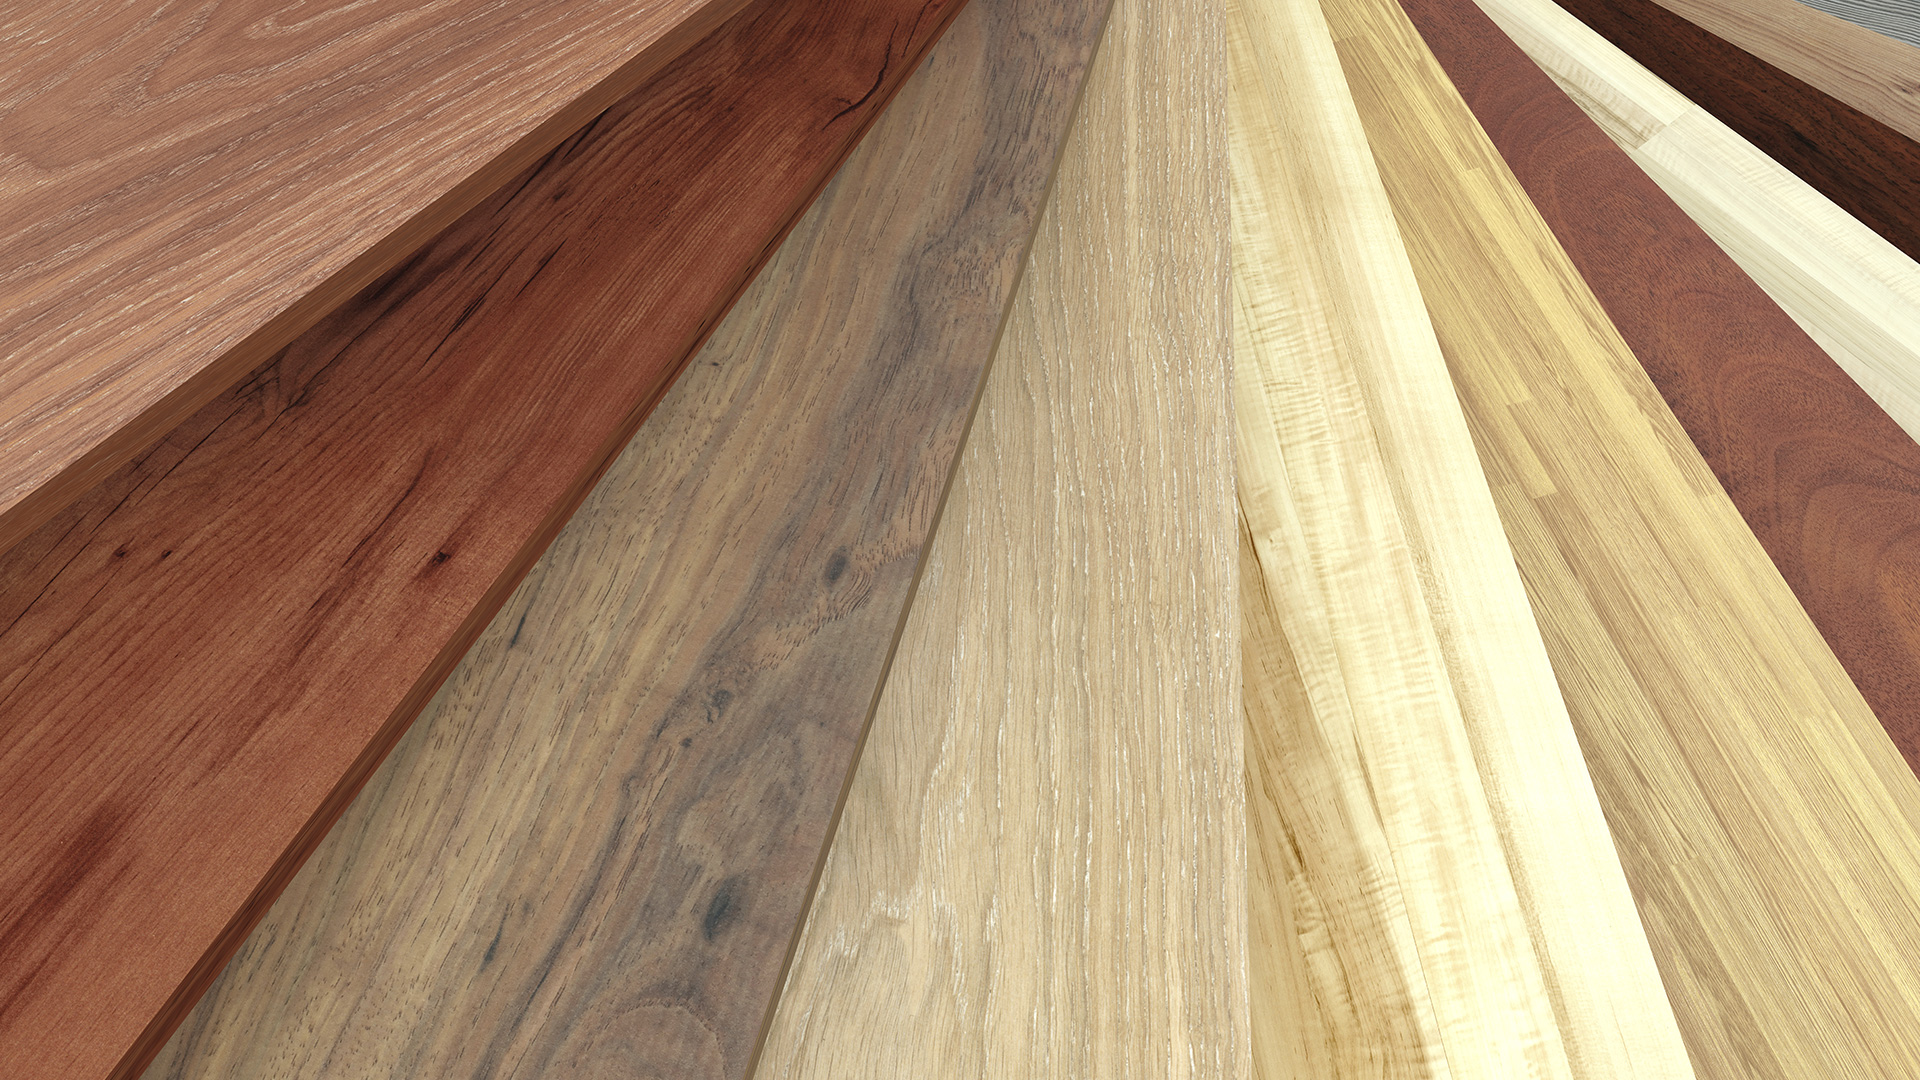 Havel Floor Covering Inc Clarkston Flooring Installation Systems